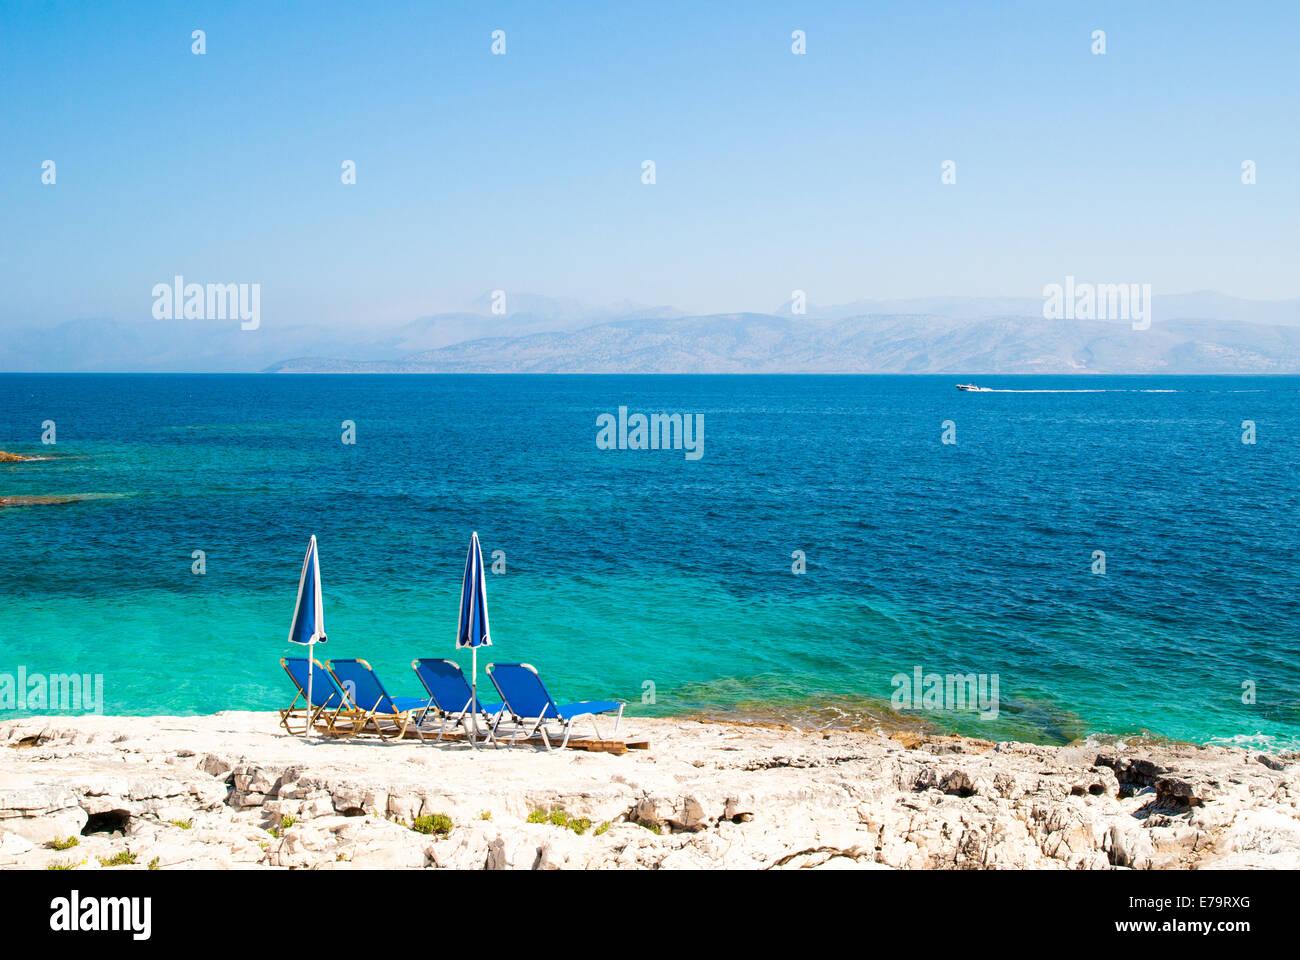 Sunbeds and umbrellas (parasols) on a rocky beach in Corfu Island, Ionian Sea, Greece Stock Photo